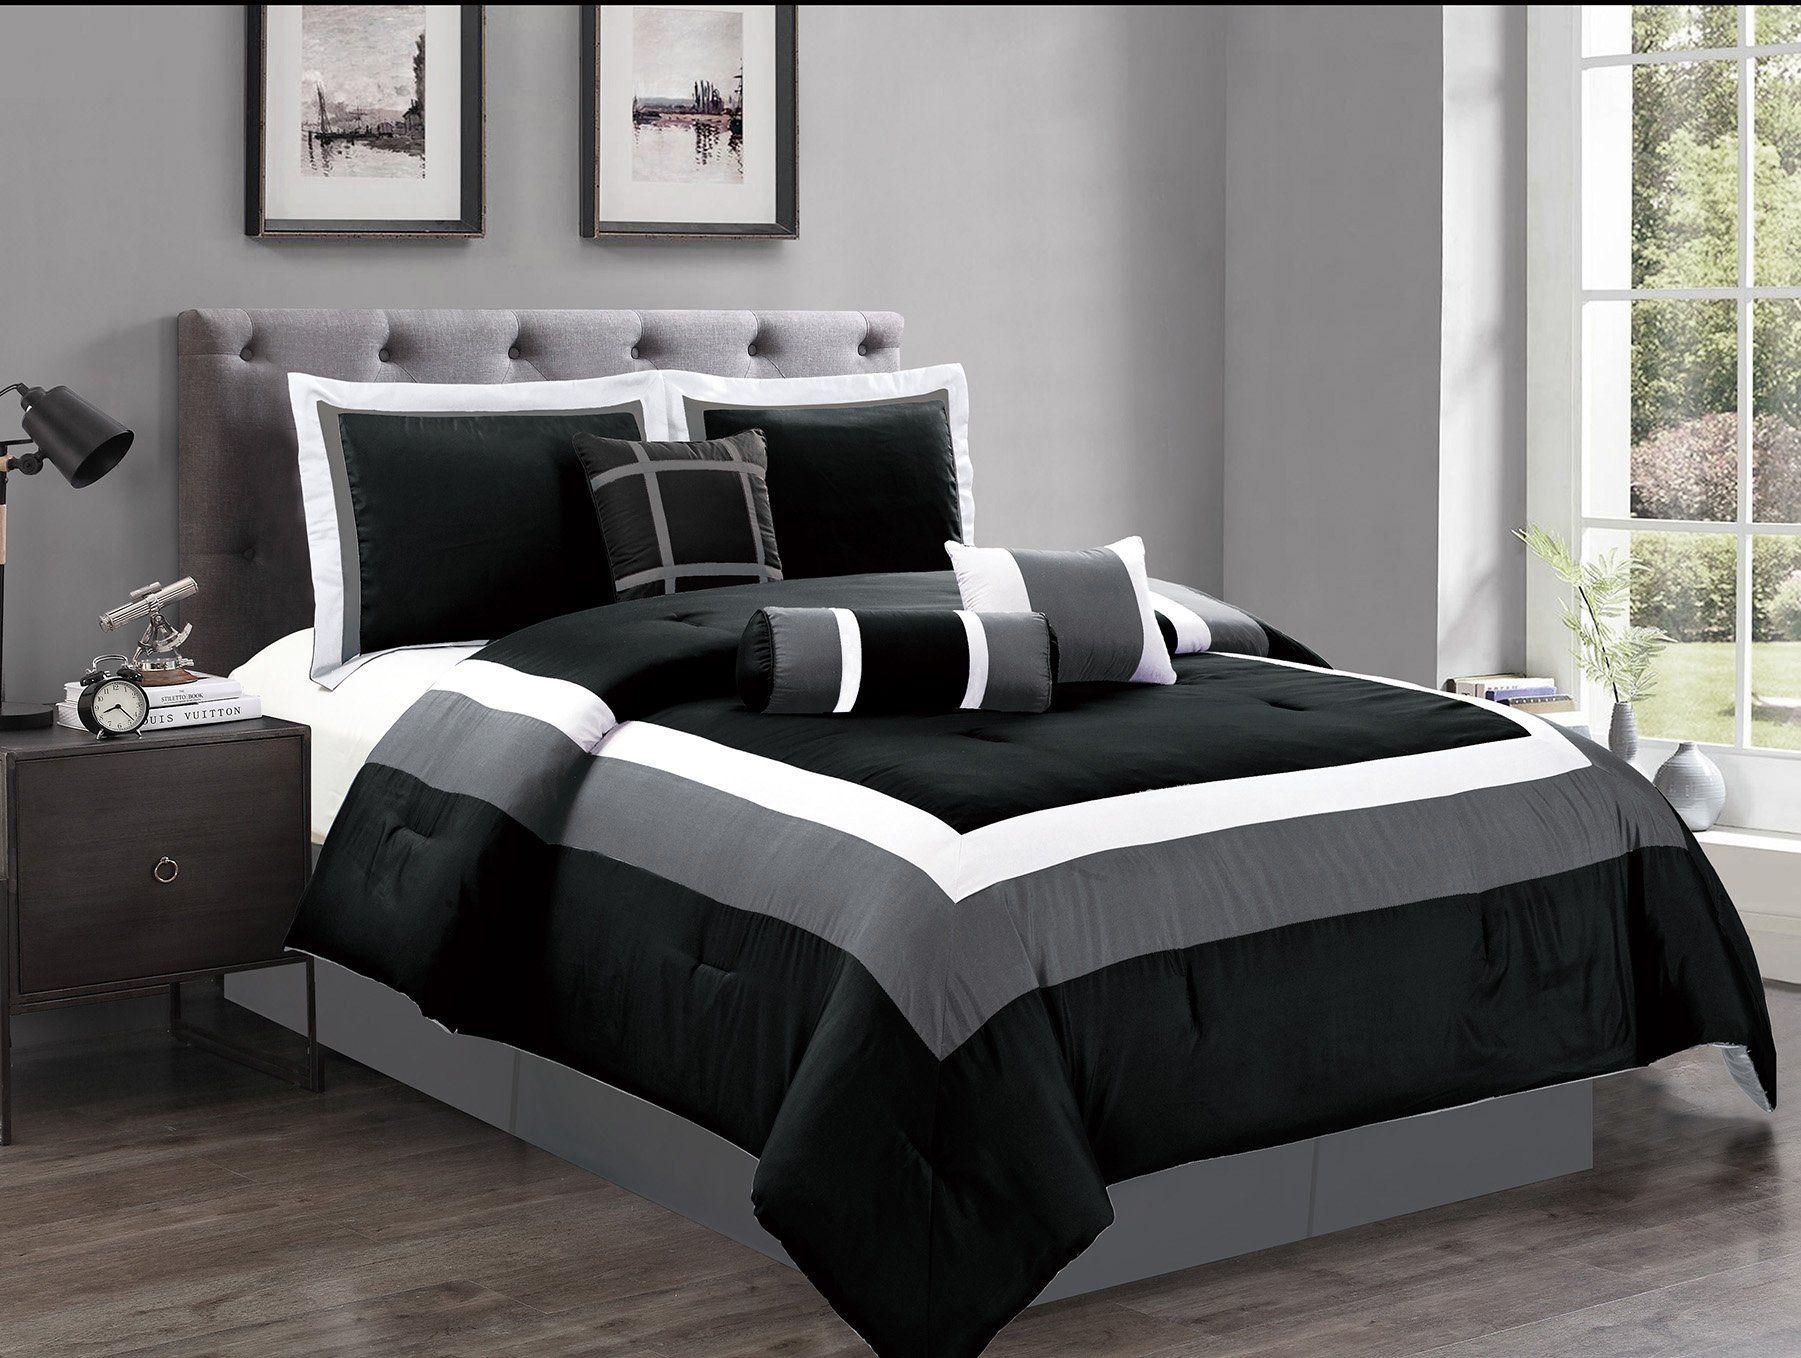 7 piece king size black white grey color block milan goose down